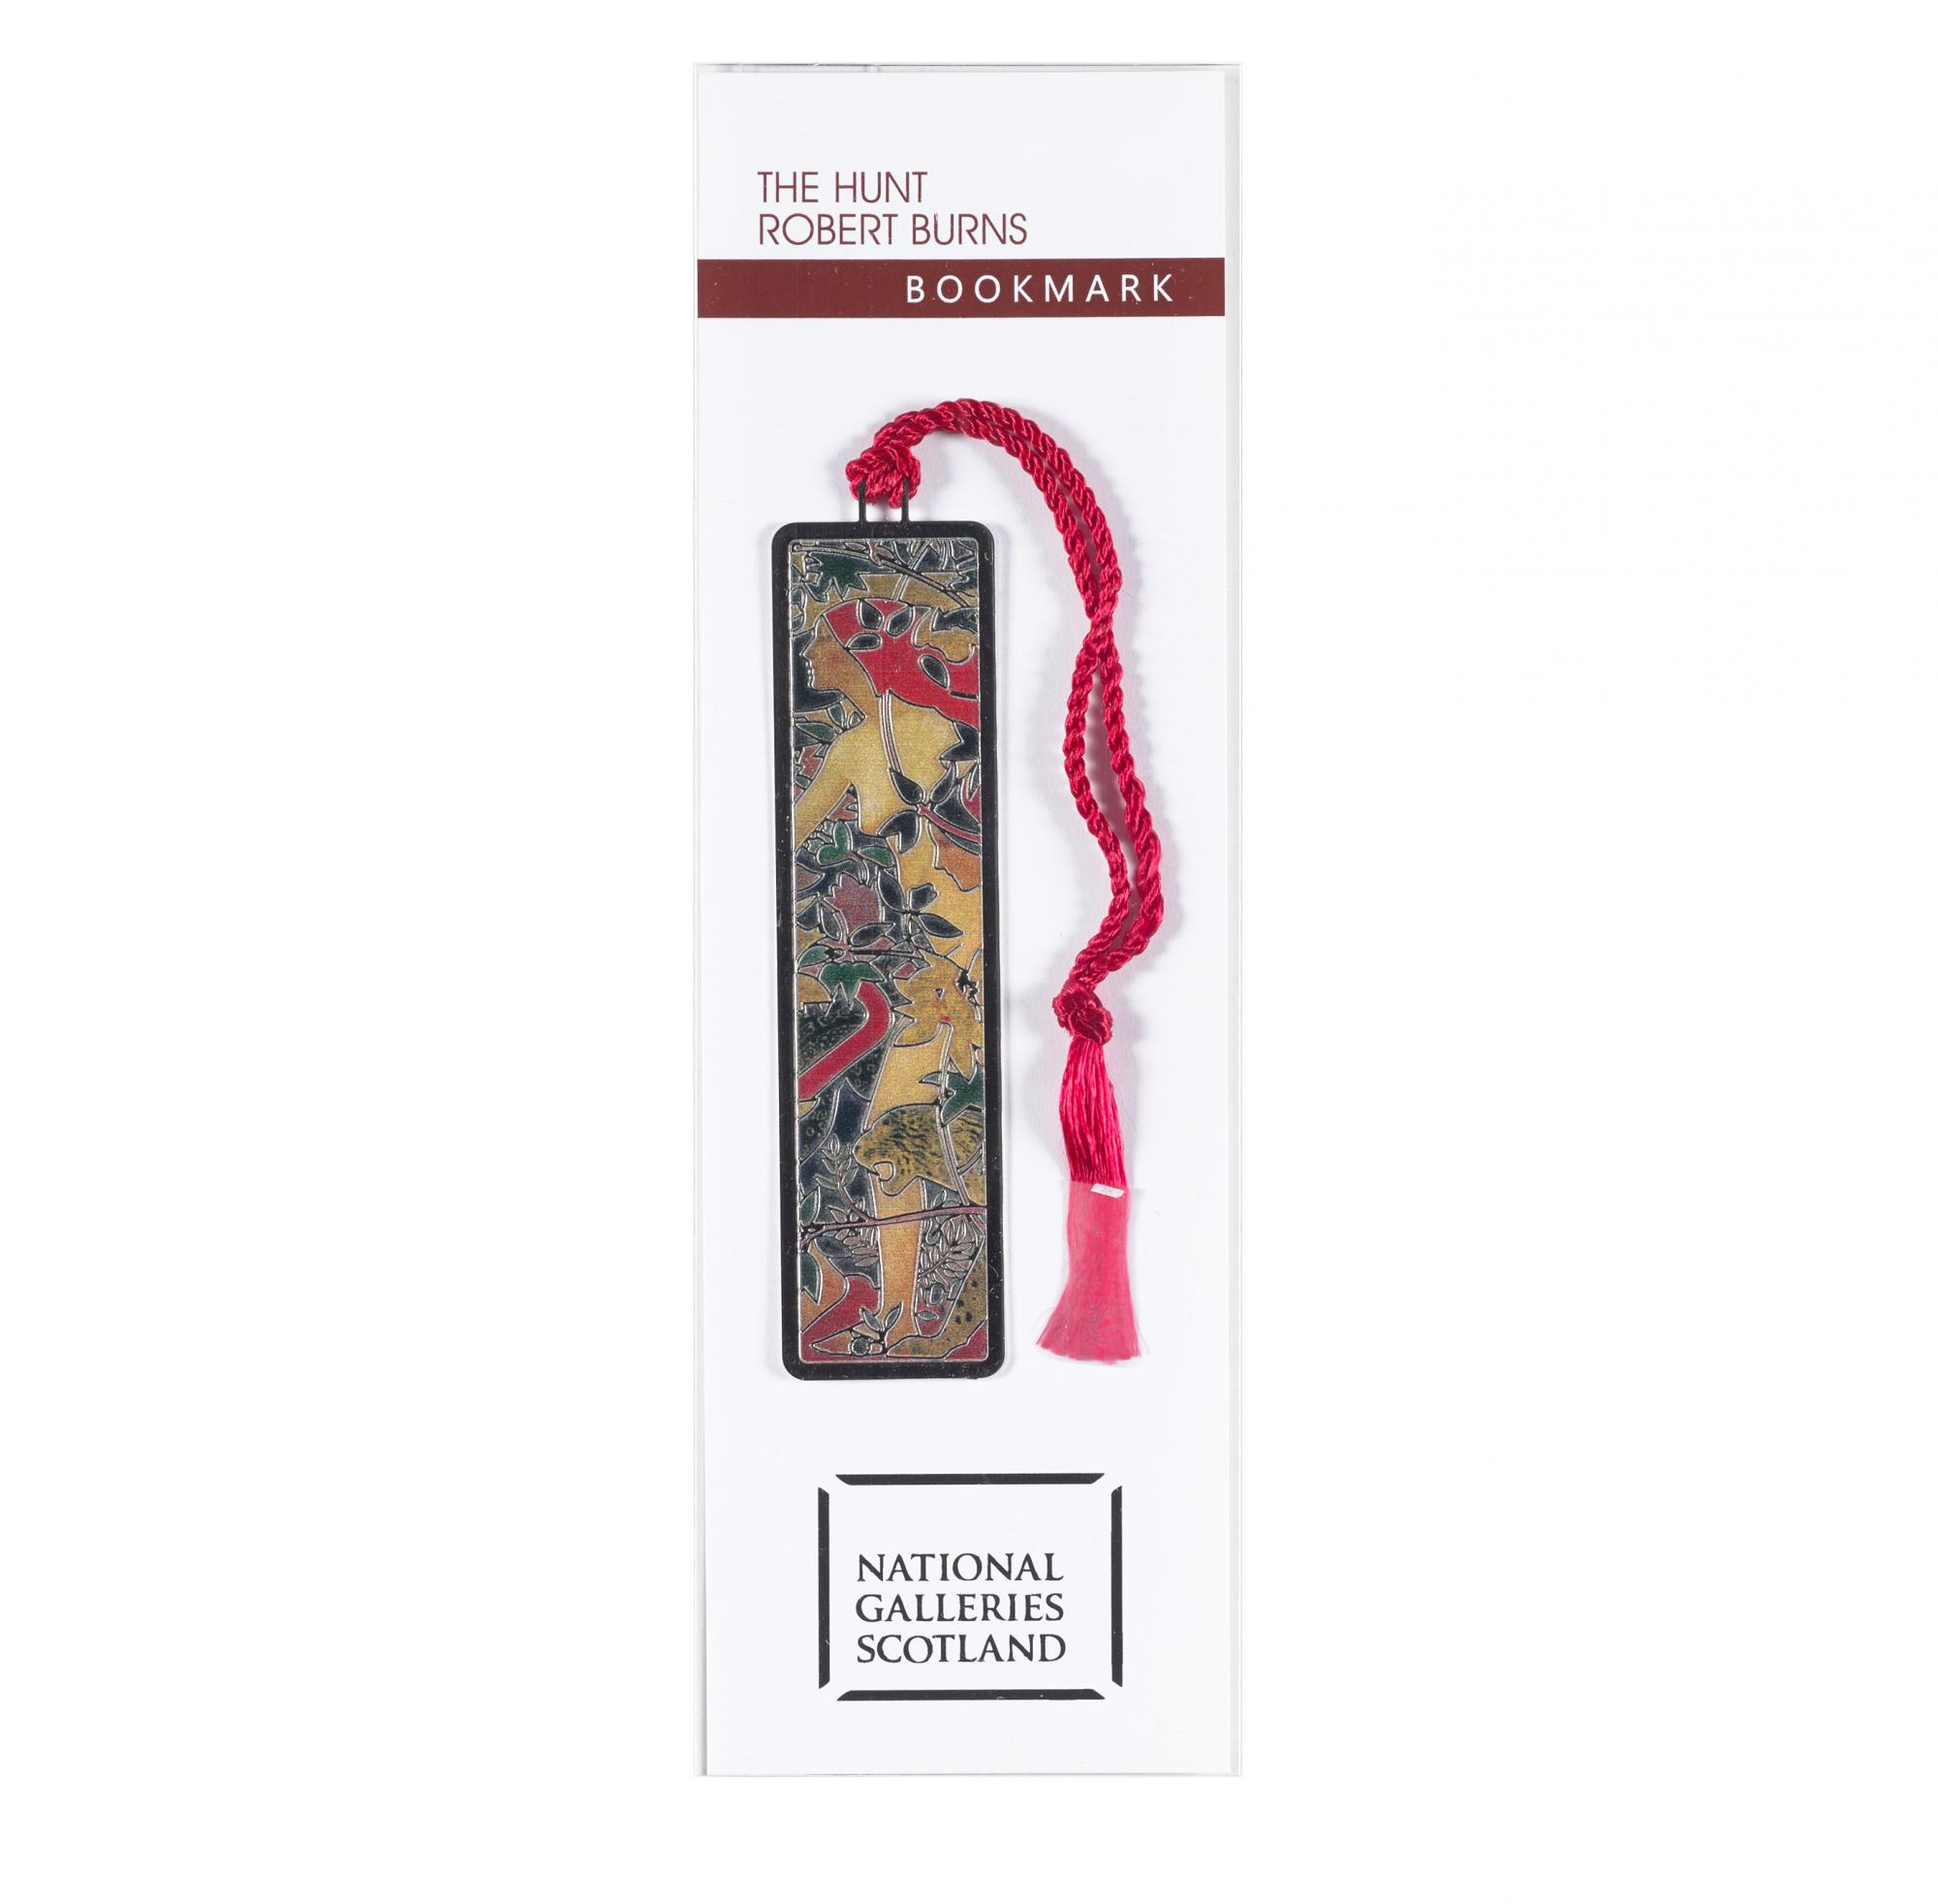 The Hunt by Robert Burns brass bookmark